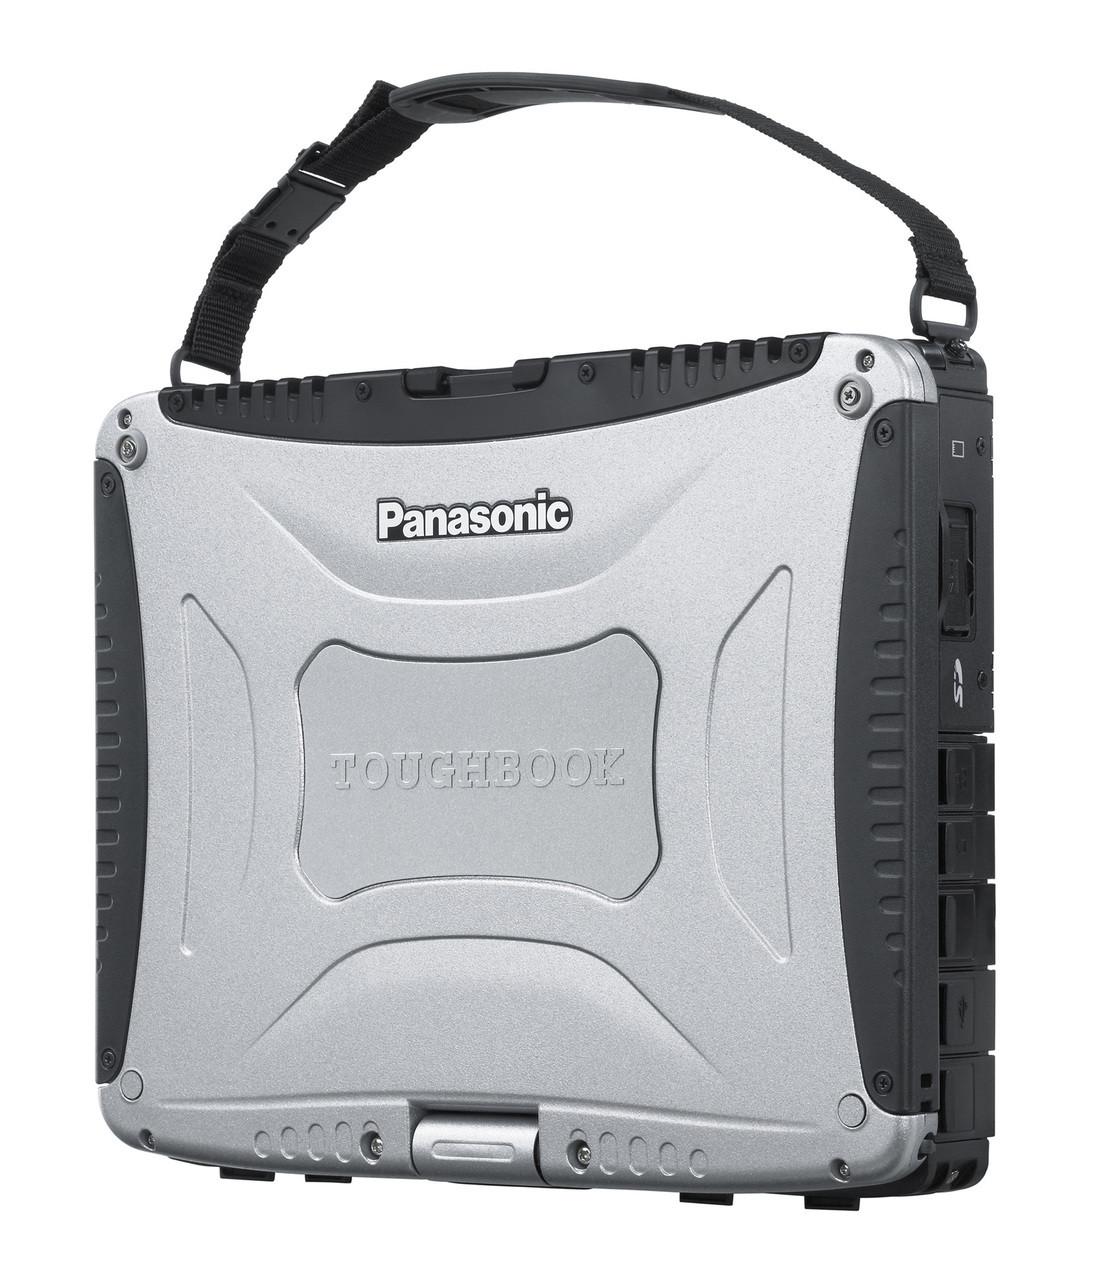 Panasonic ToughBook CF-19KHRAX2B Compact